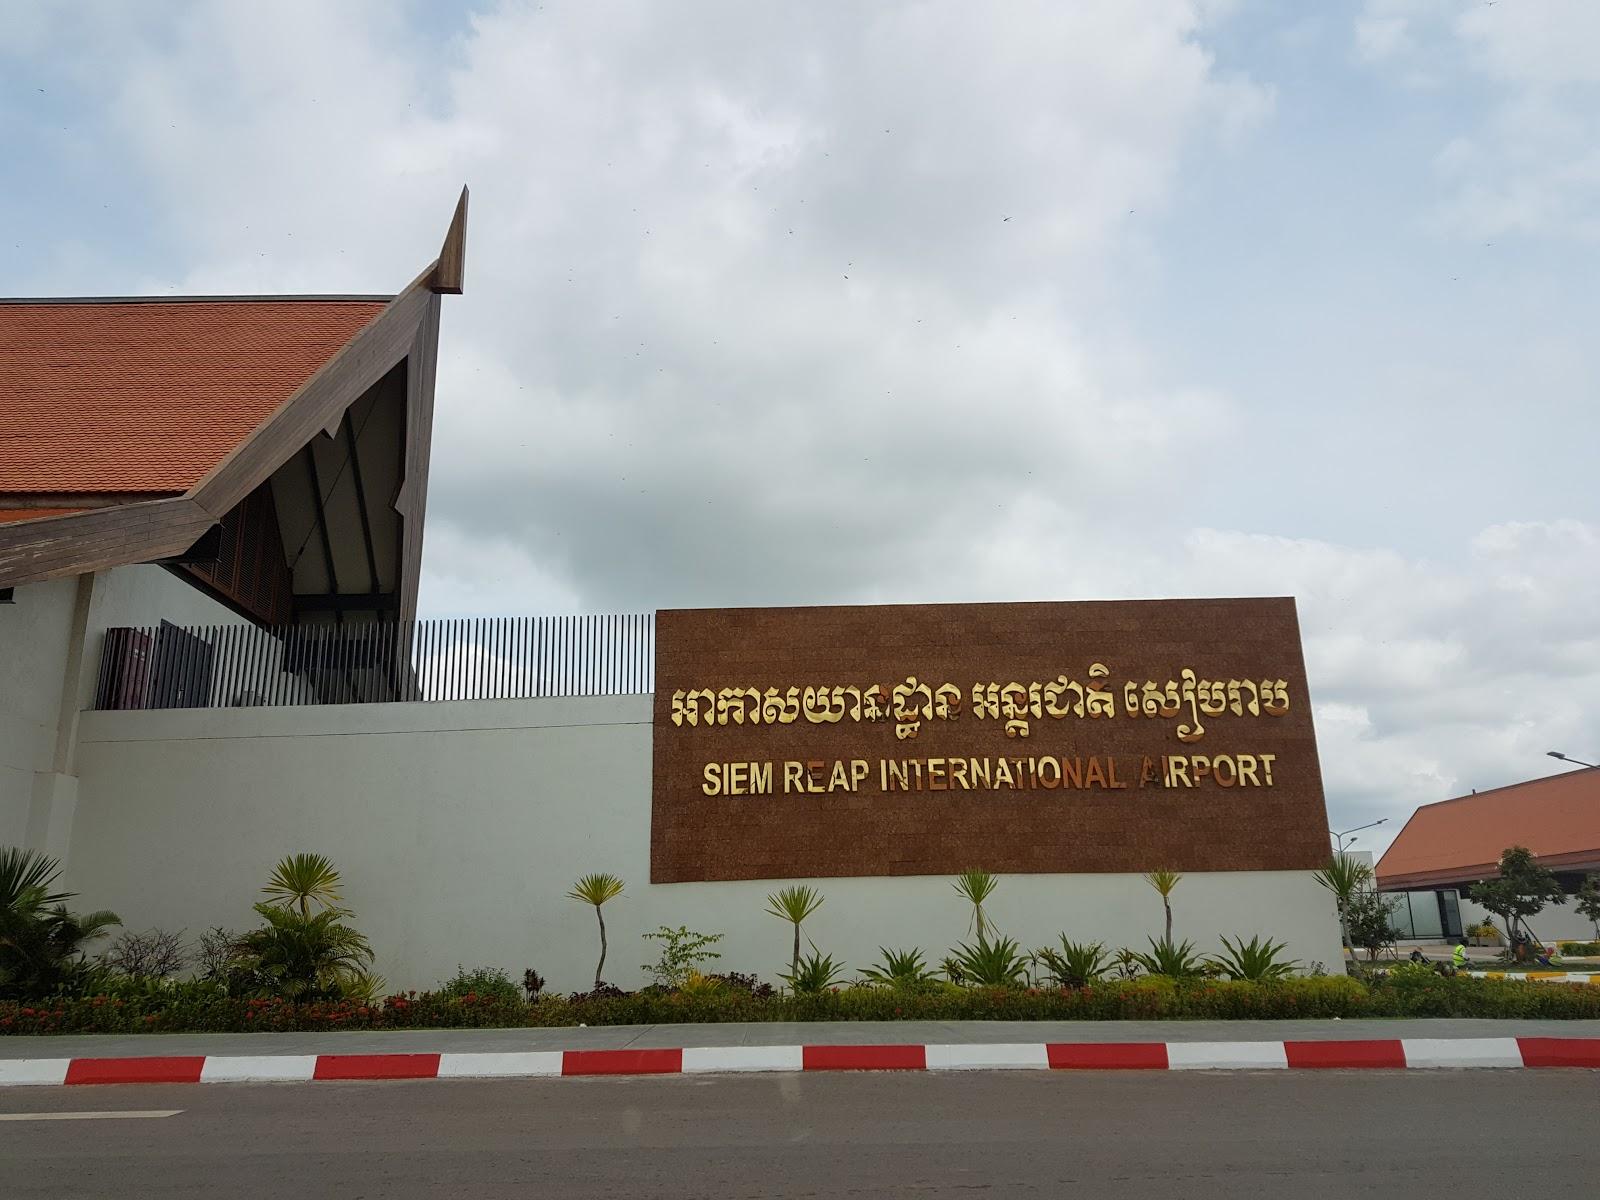 Tempat Shopping Murah di Ho Chi Minh, Vietnam - Ana Suhana